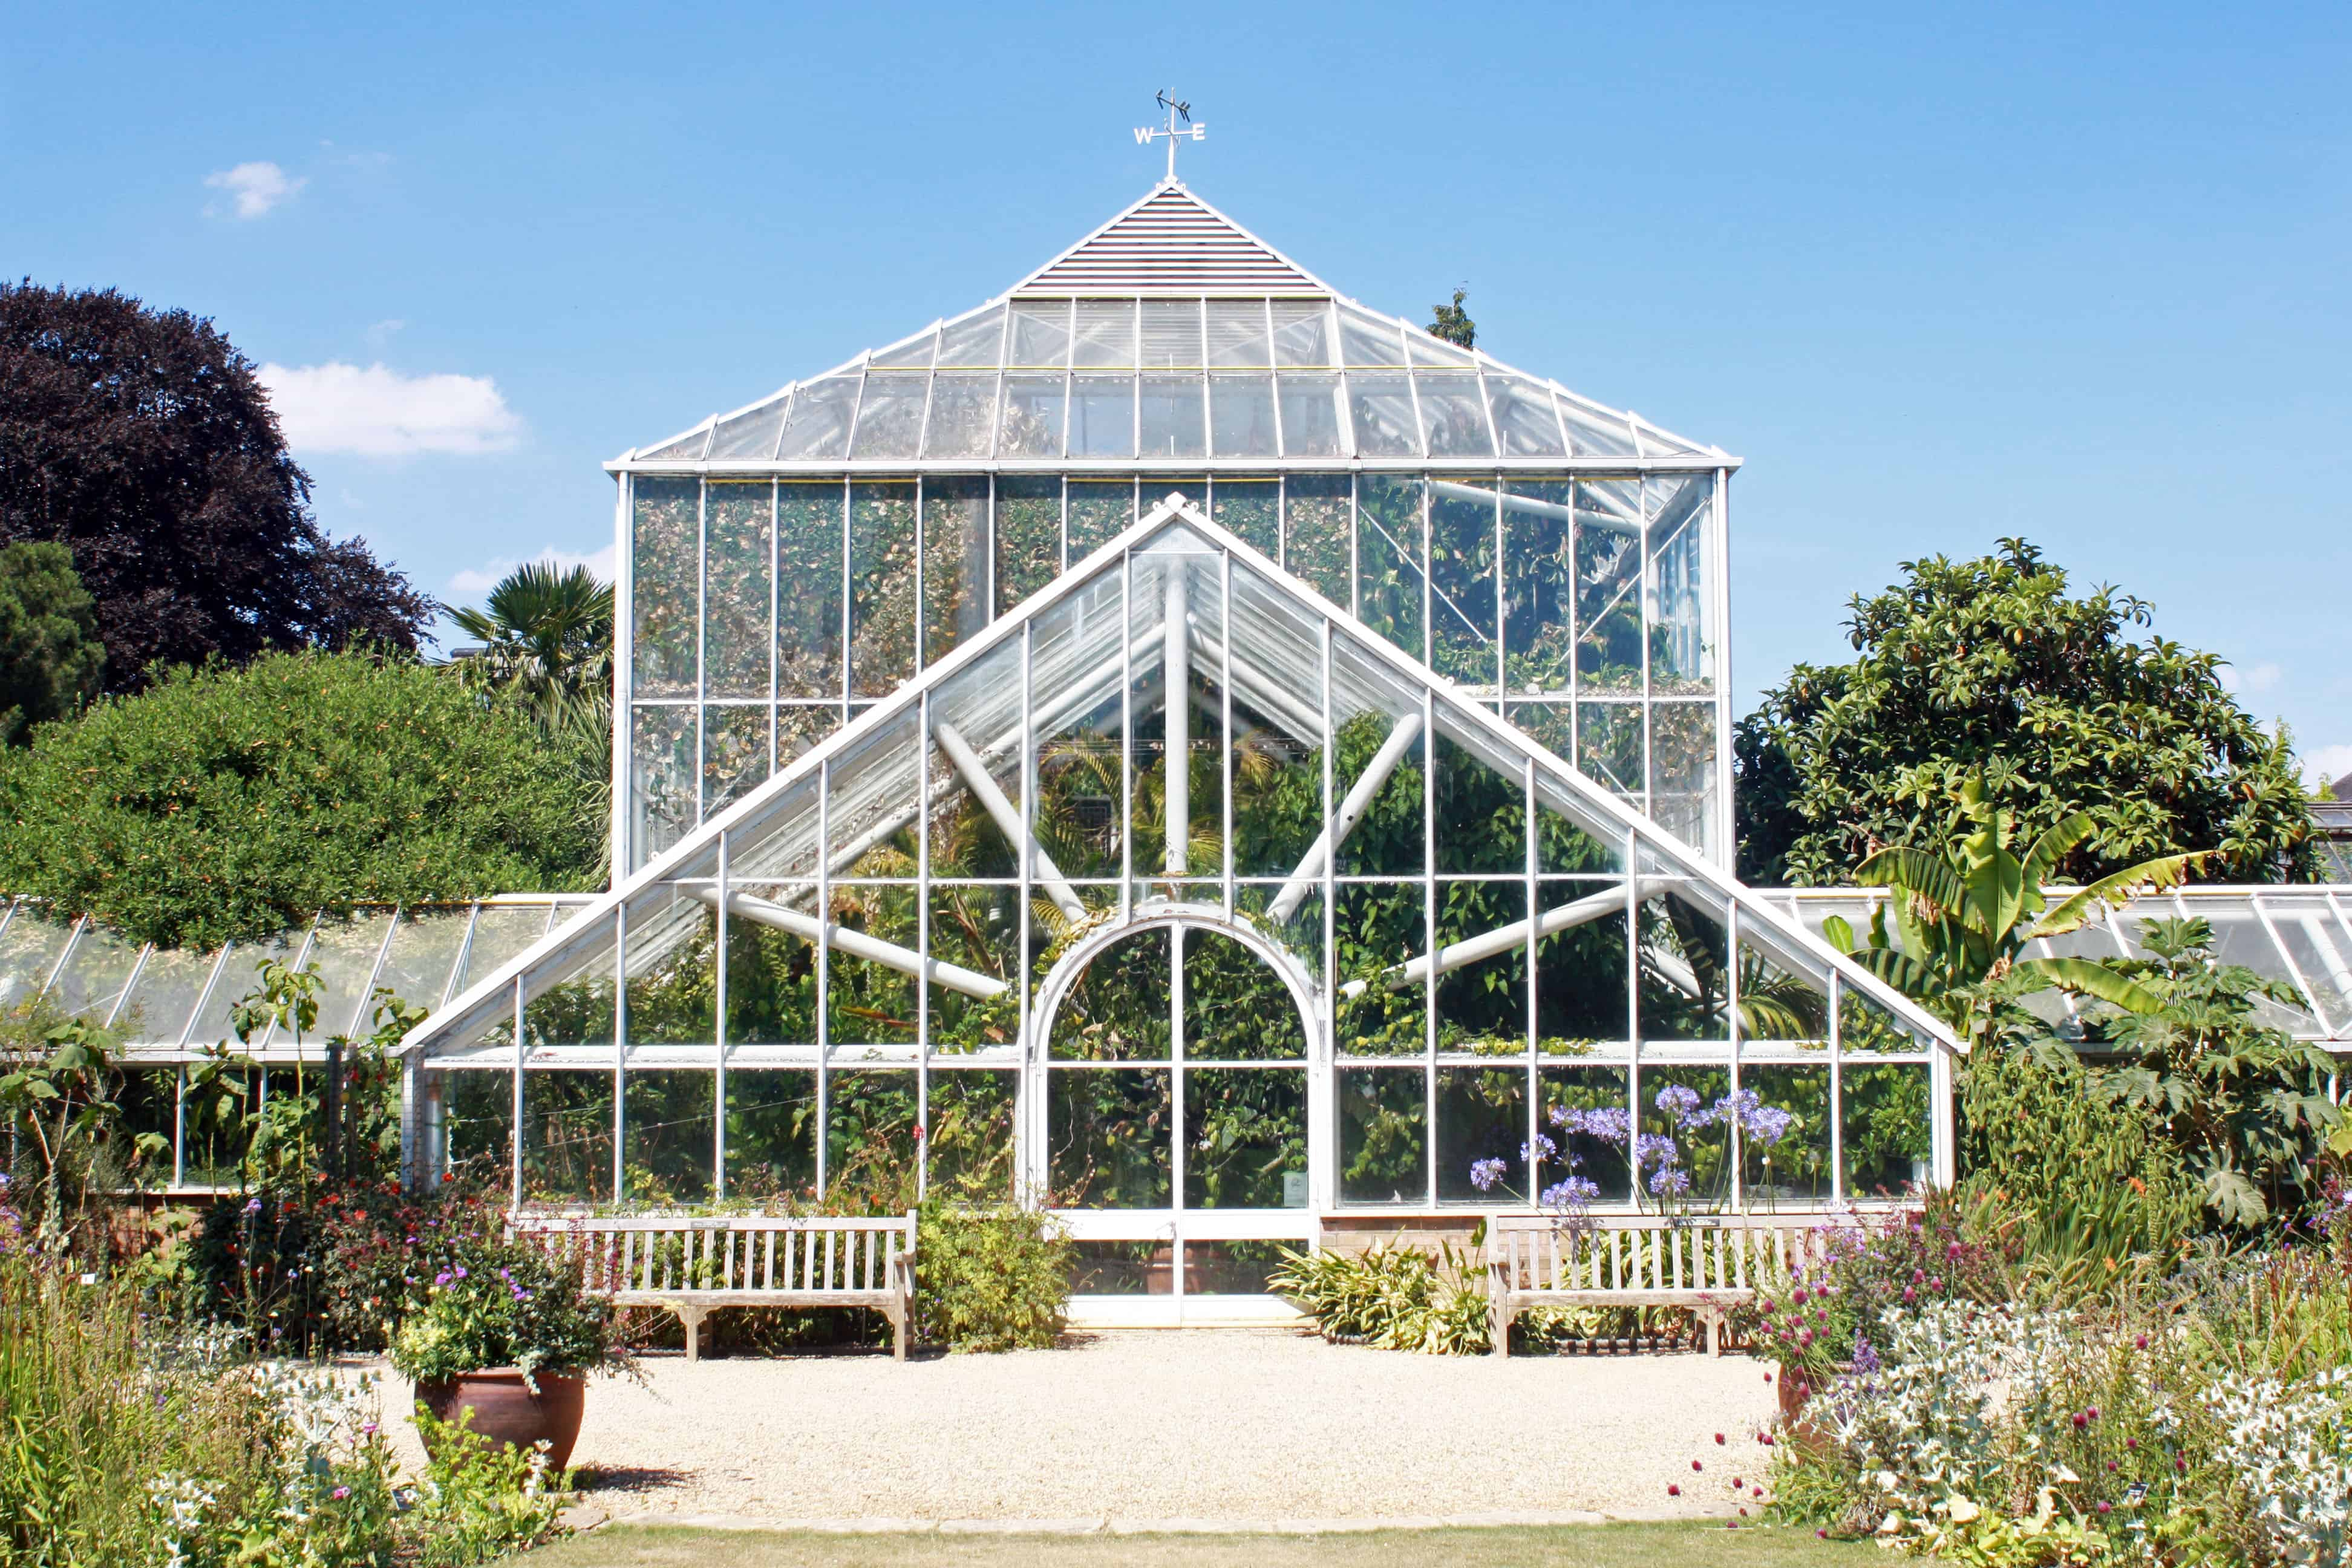 Cambridge University Botanic Garden Greenhouse